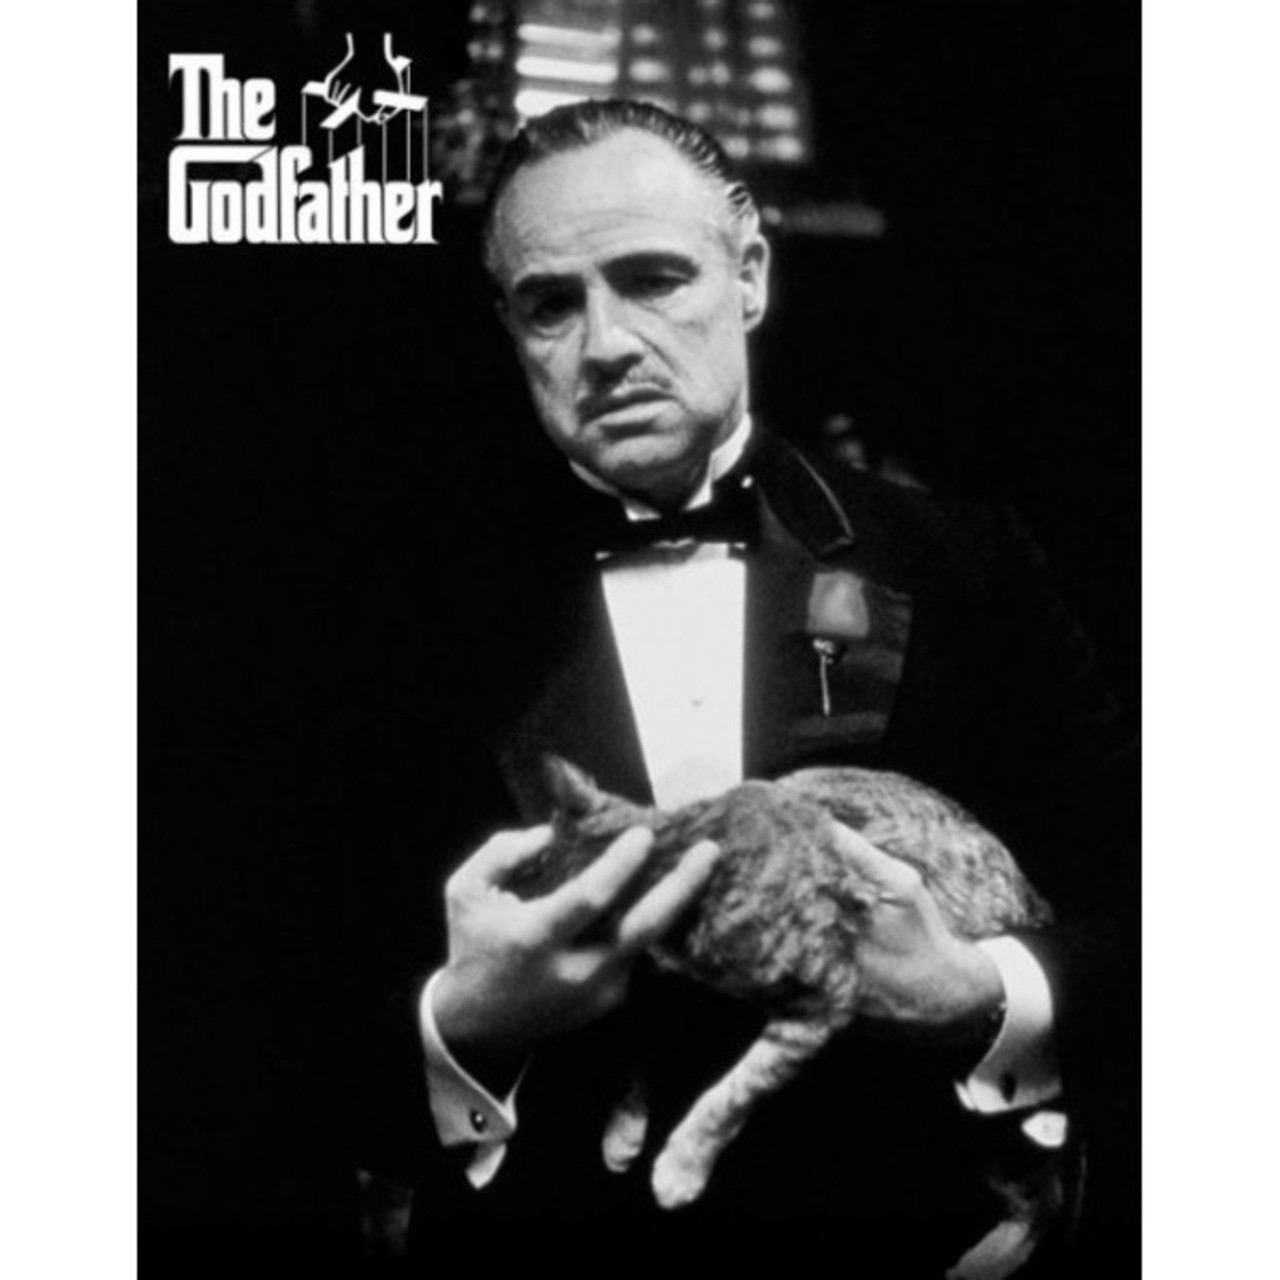 The Godfather Marlon Brando Quote Poster 16 x 20